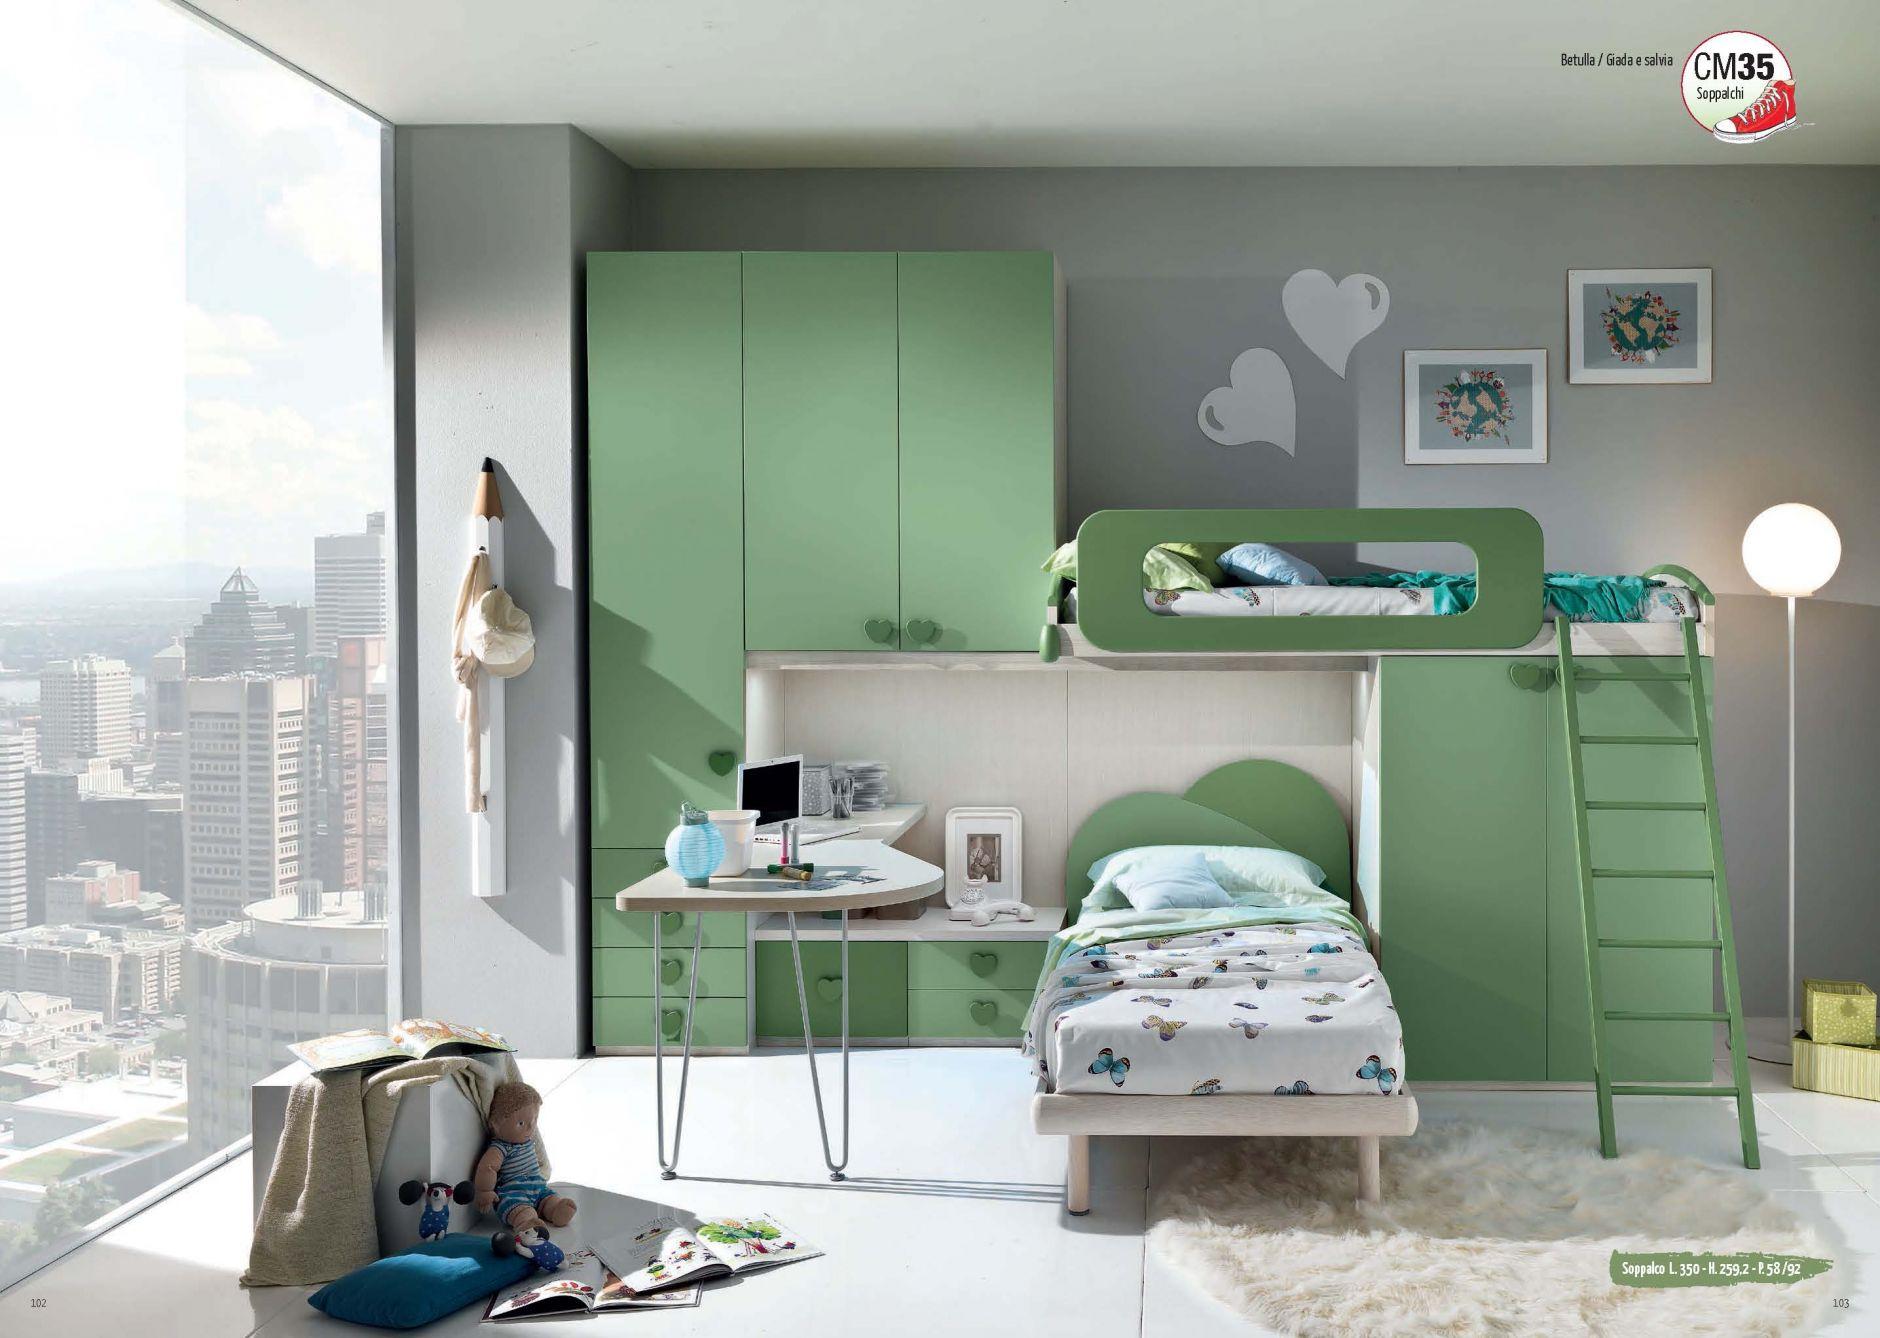 Muebles De Los Ni Os Muebles Giessegi Composici N Sm35  # Giessegi Muebles Infantil